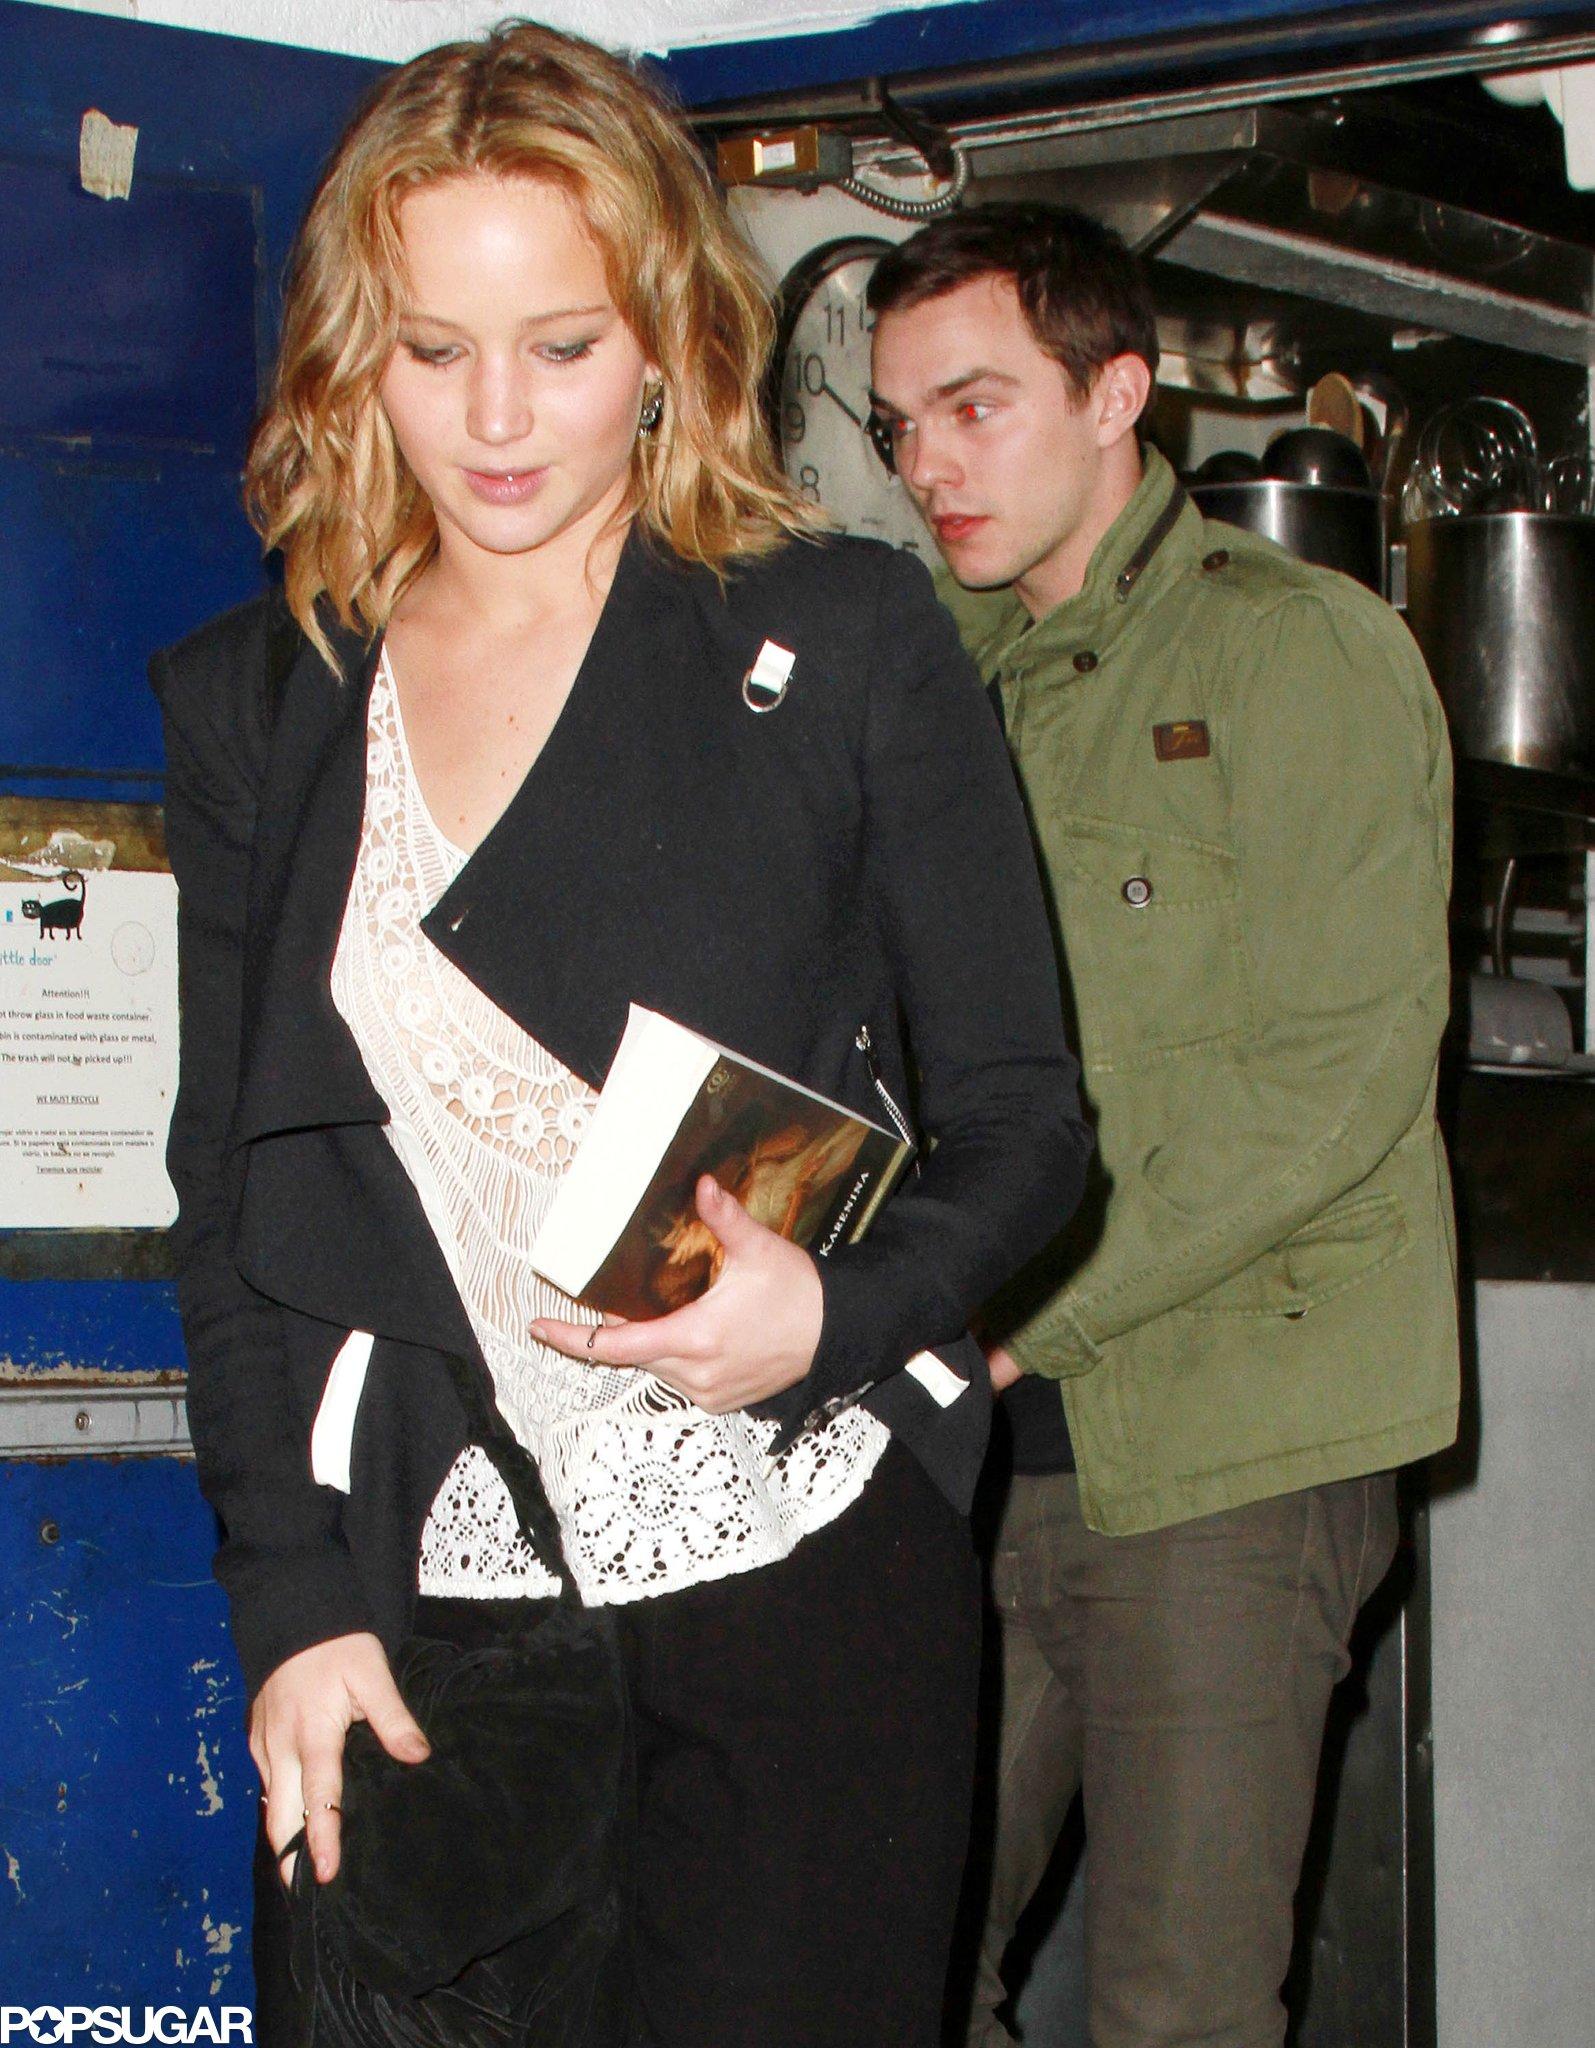 Jennifer Lawrence carried a copy of Anna Karenina.